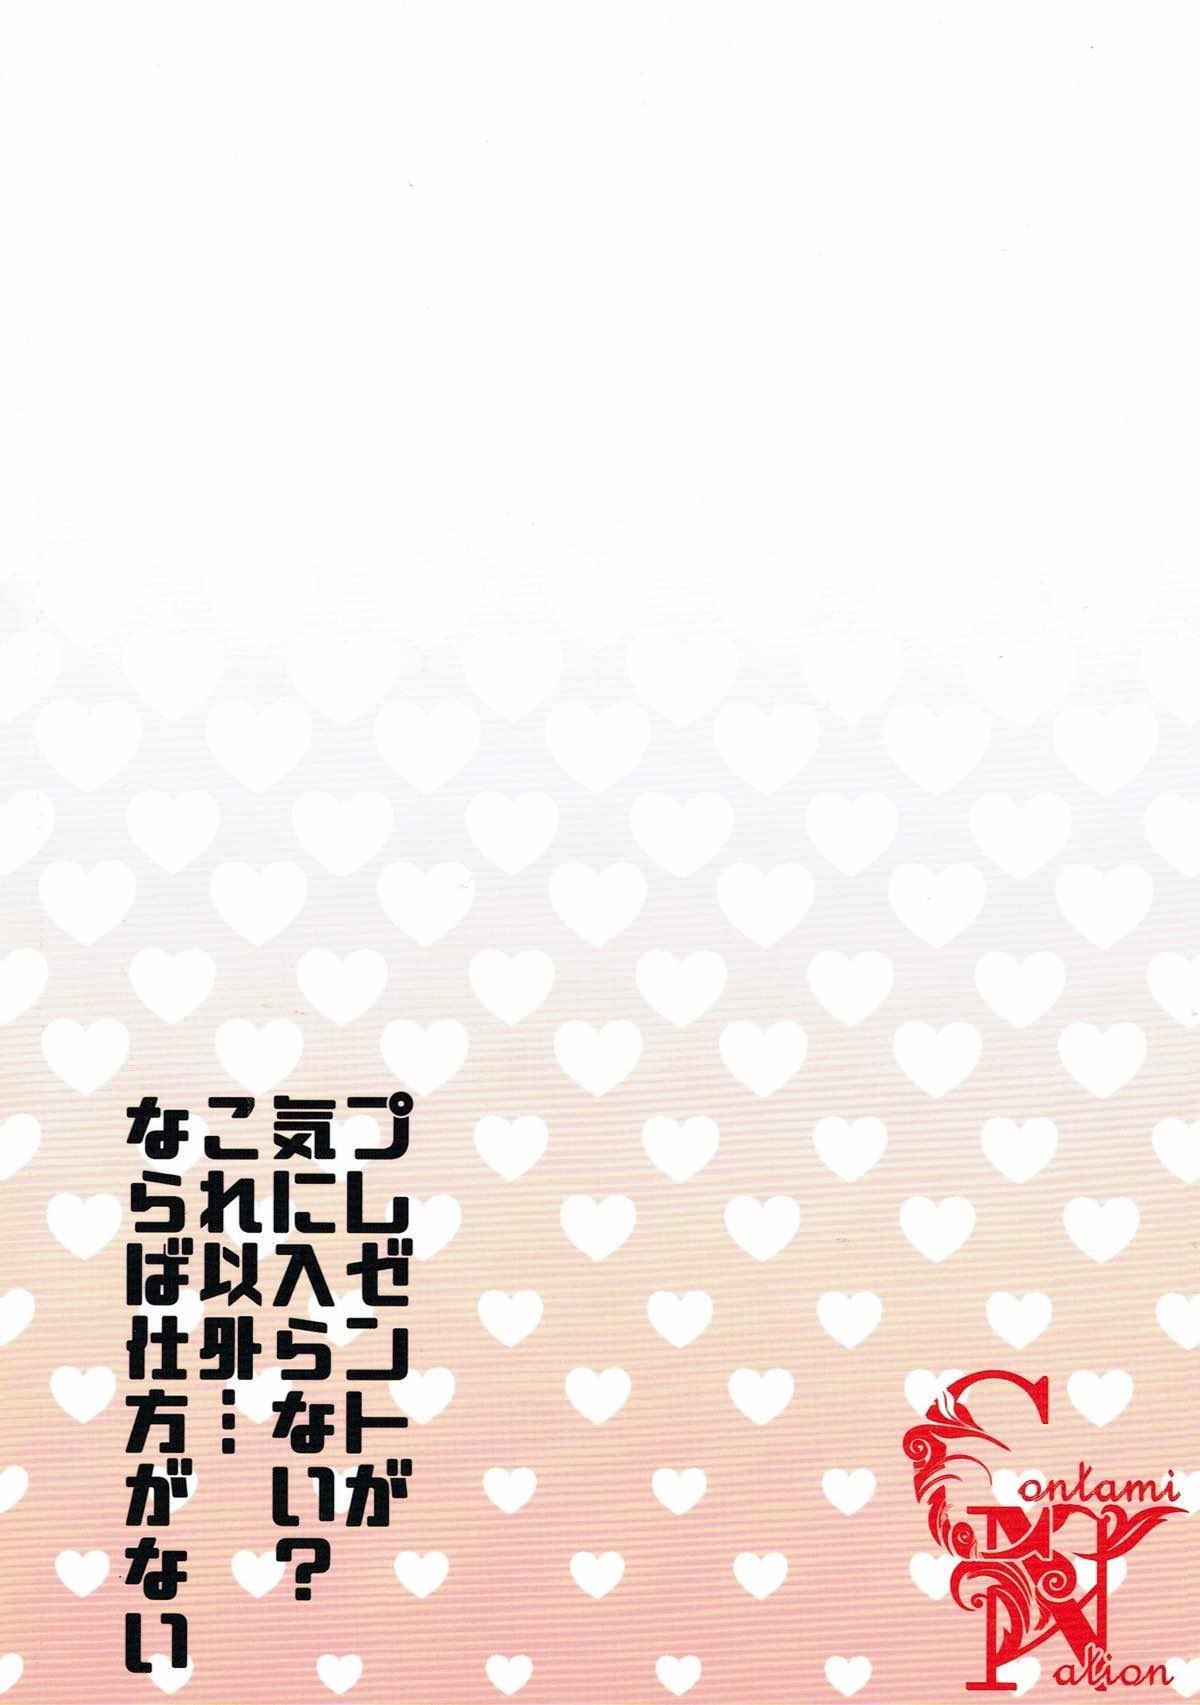 Present ga Ki ni Iranai? Kore Igai... Naraba Shikata ga Nai | You don't like the present? Something else... I guess it can't be helped then 17